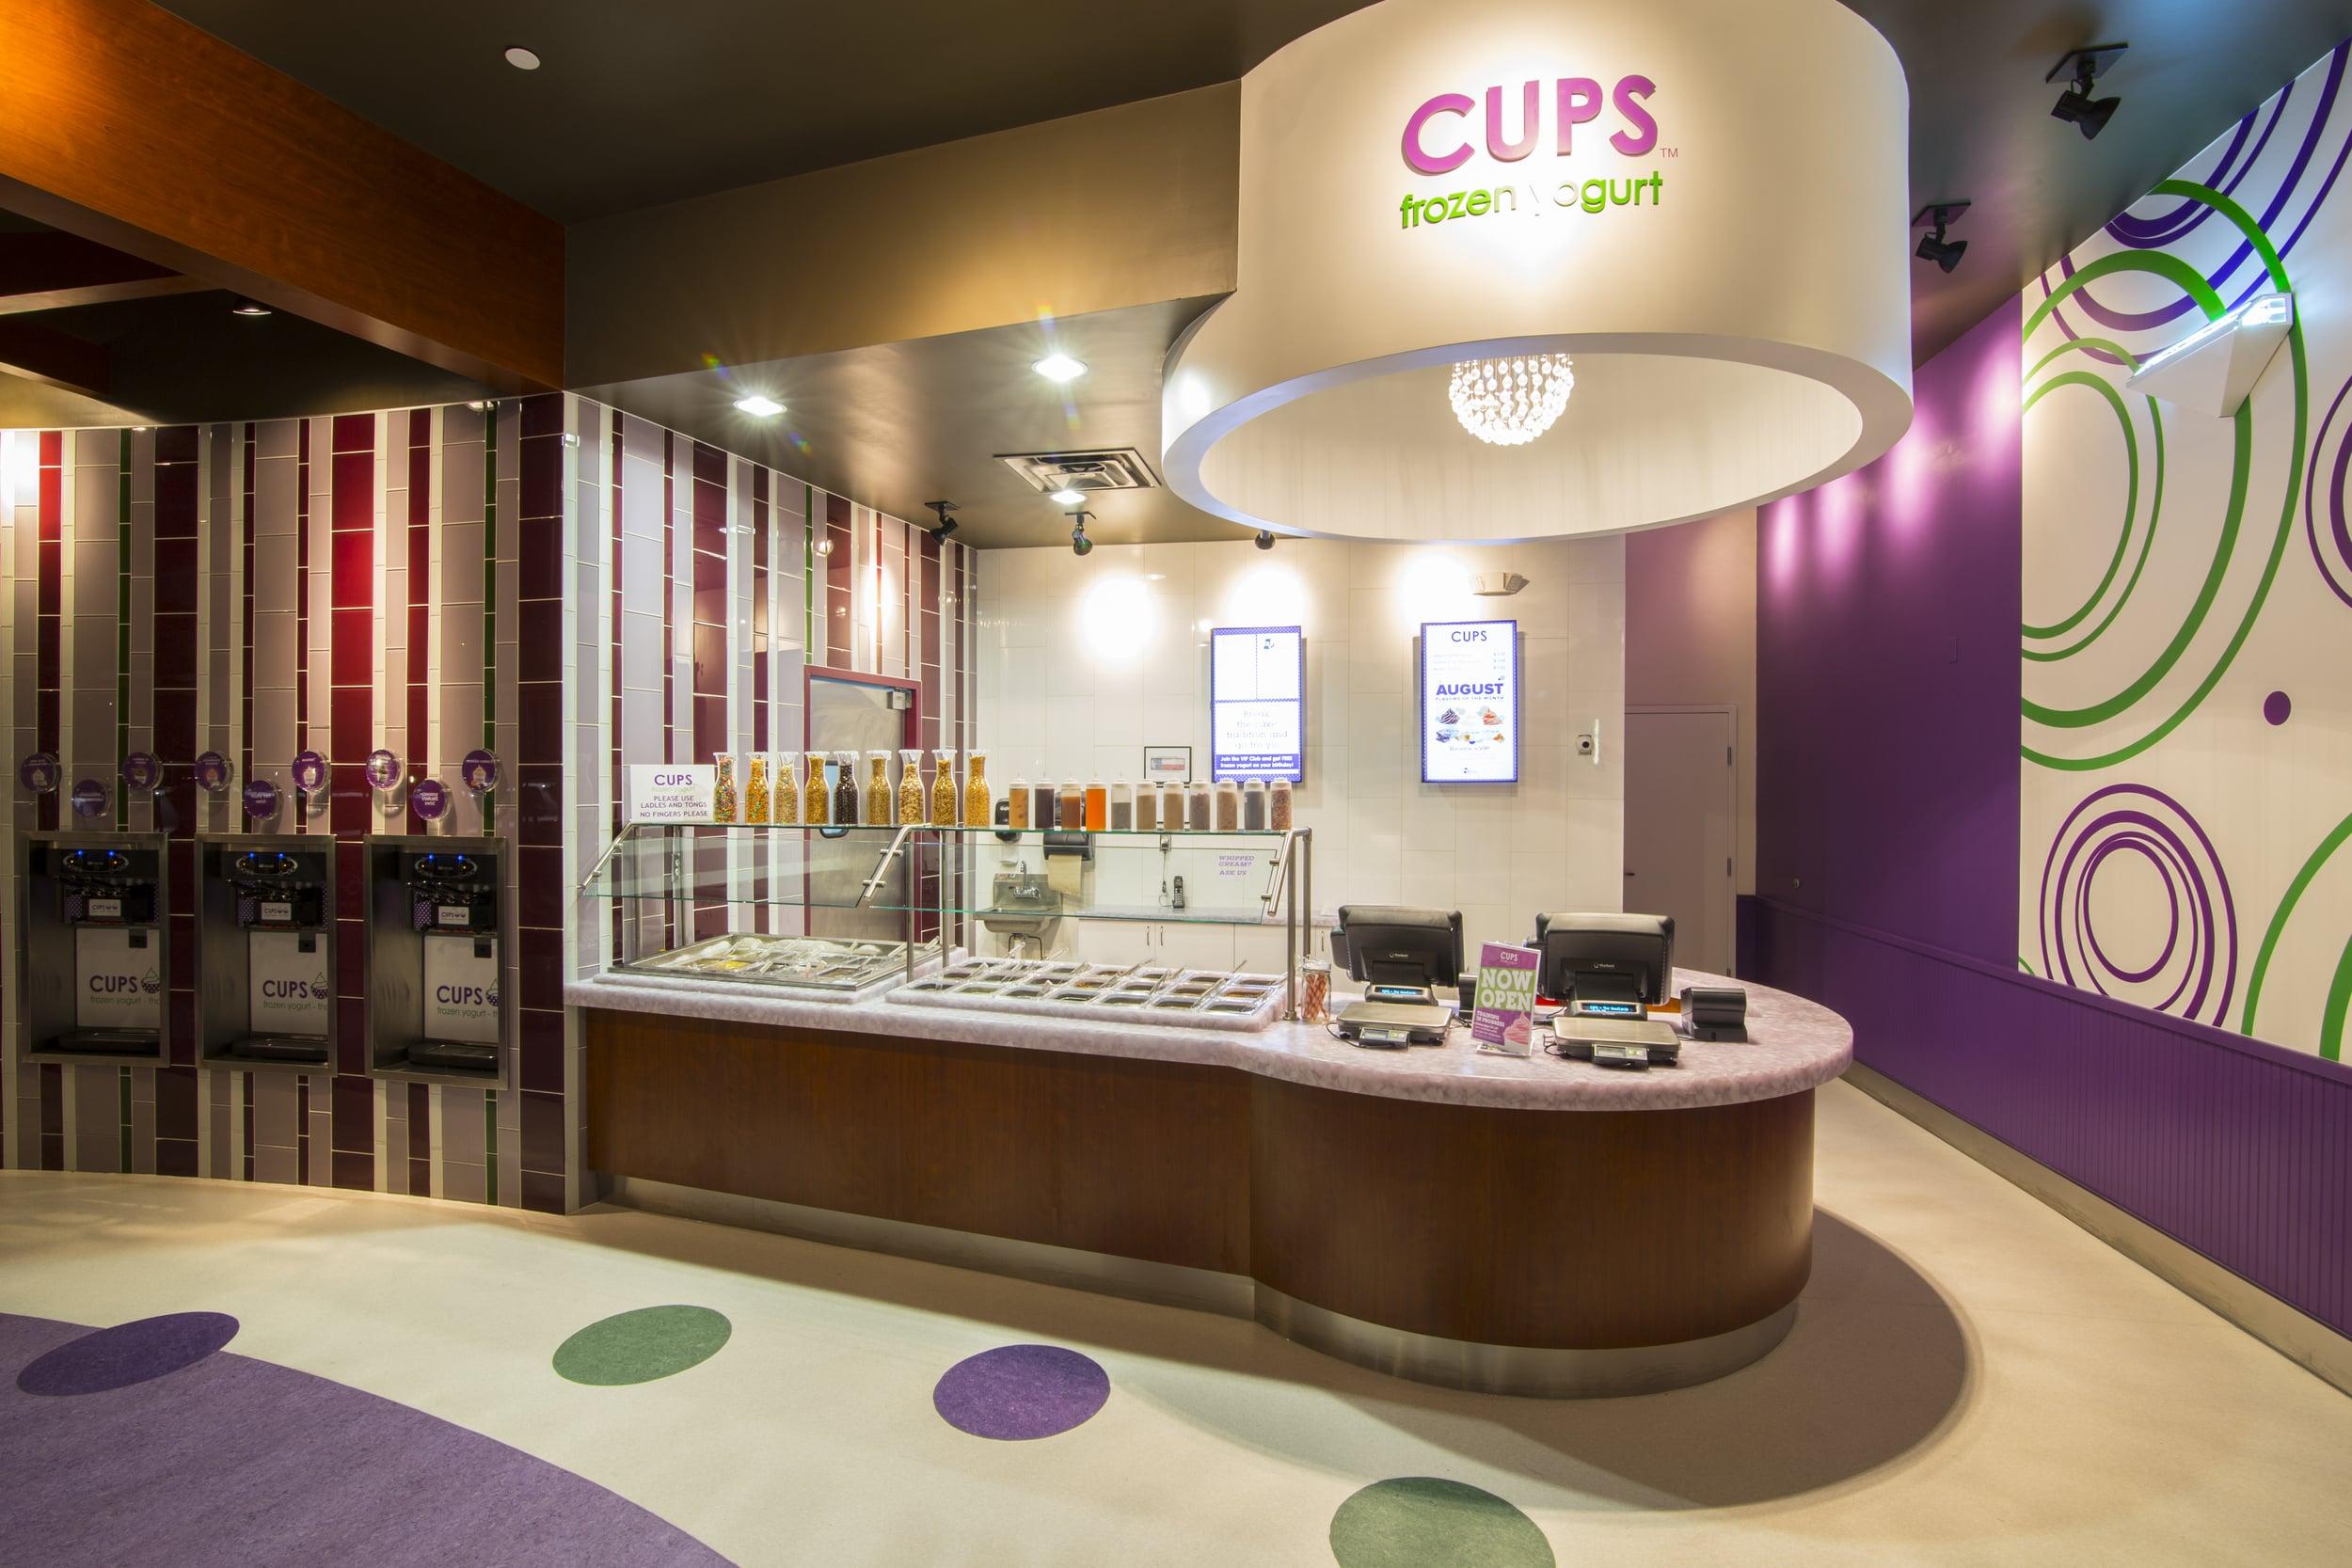 CUPS Frozen Yogurt (3).jpg